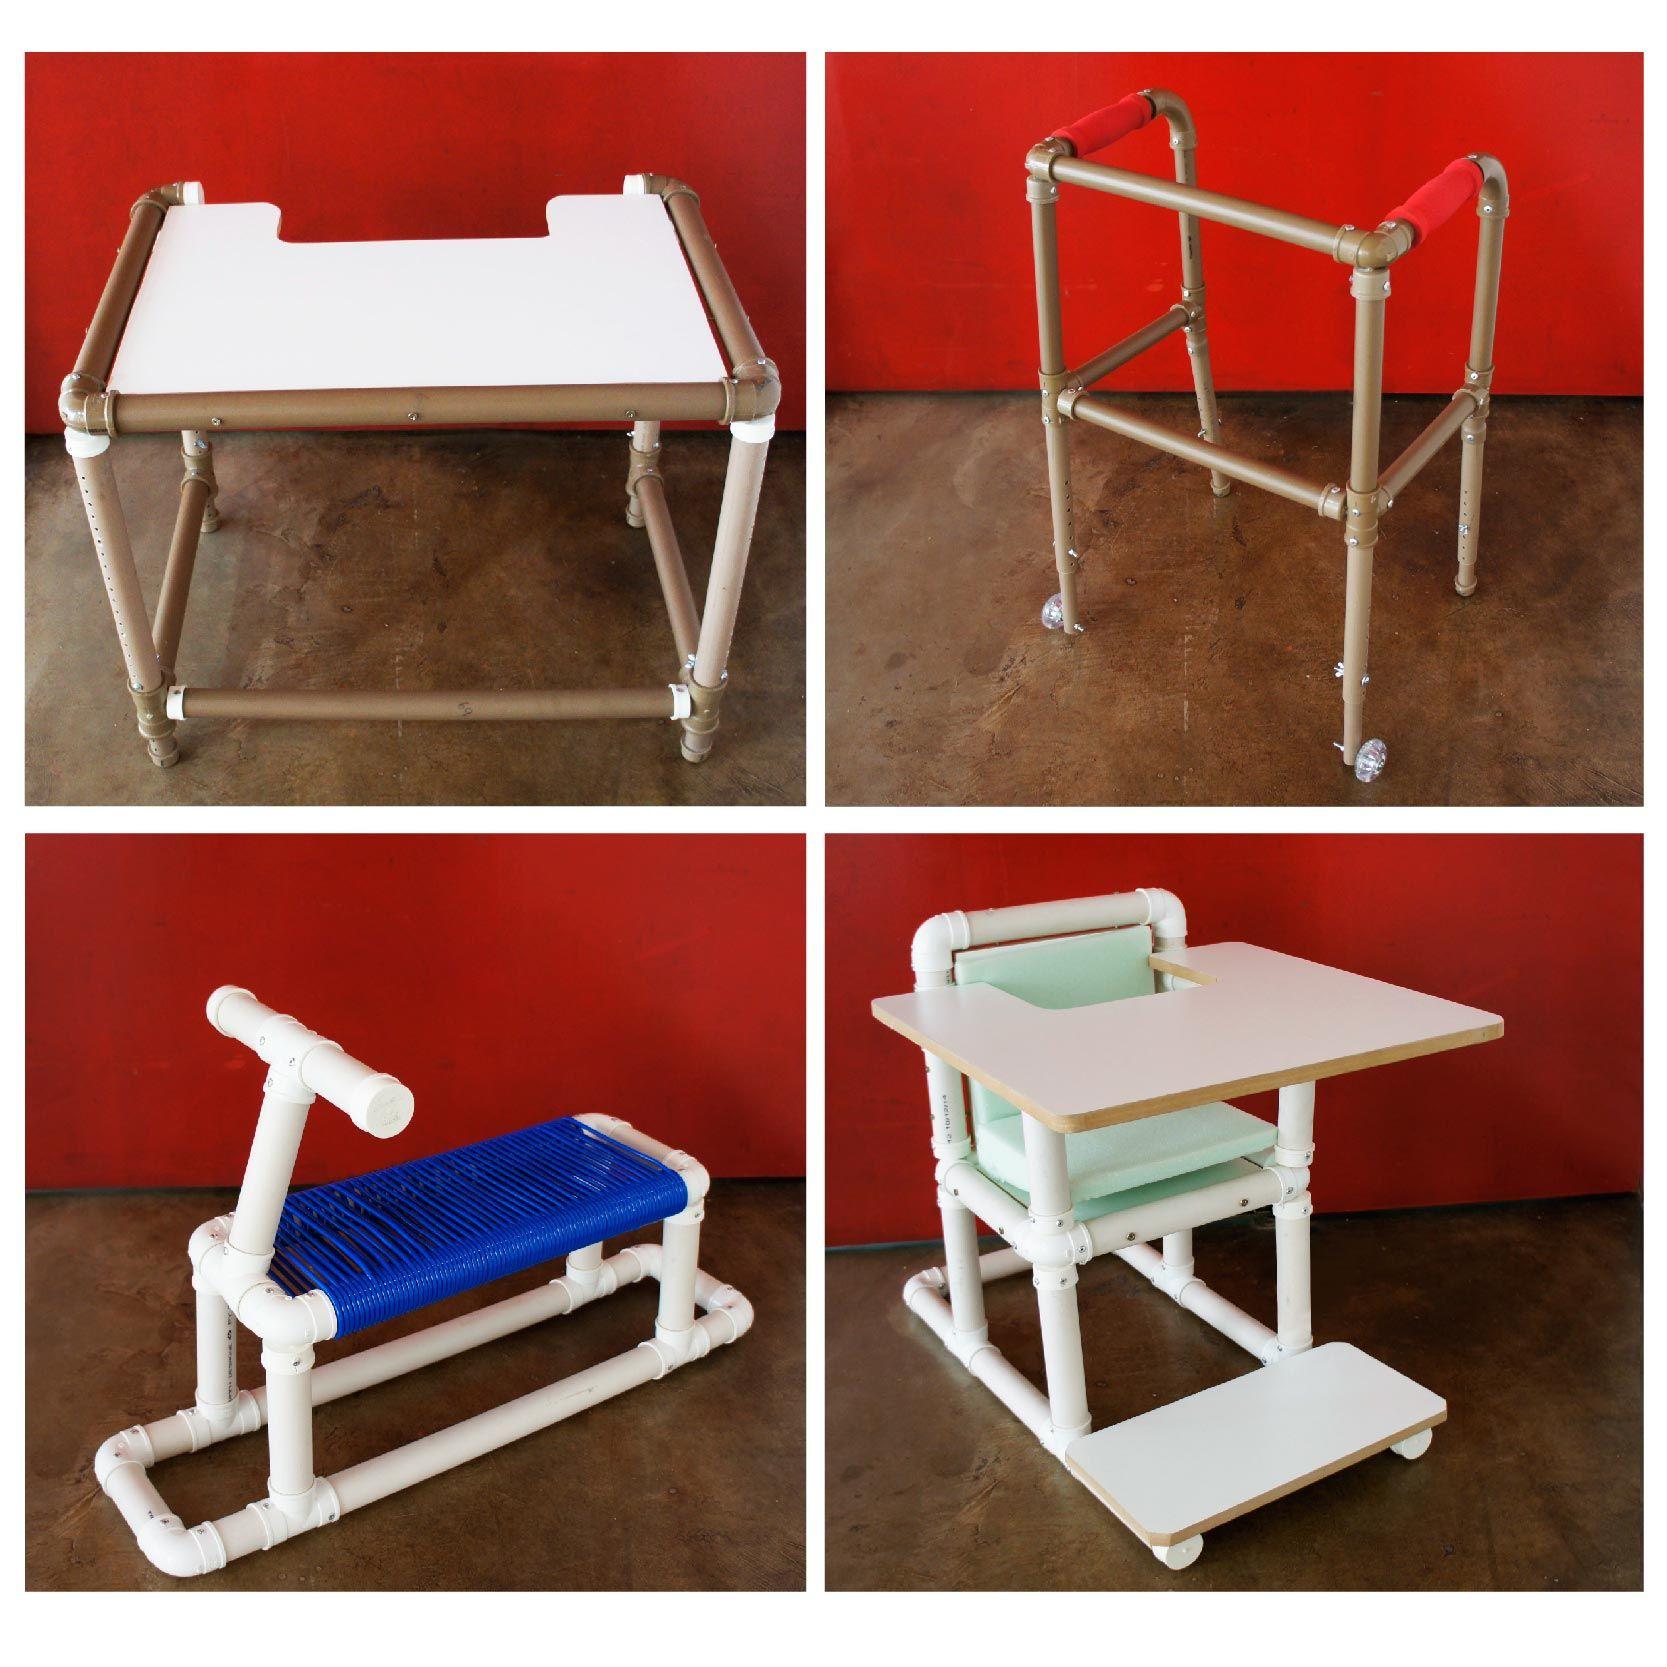 Mobiliarios adaptados en pvc teleton teletonparaguay - Manualidades con muebles ...